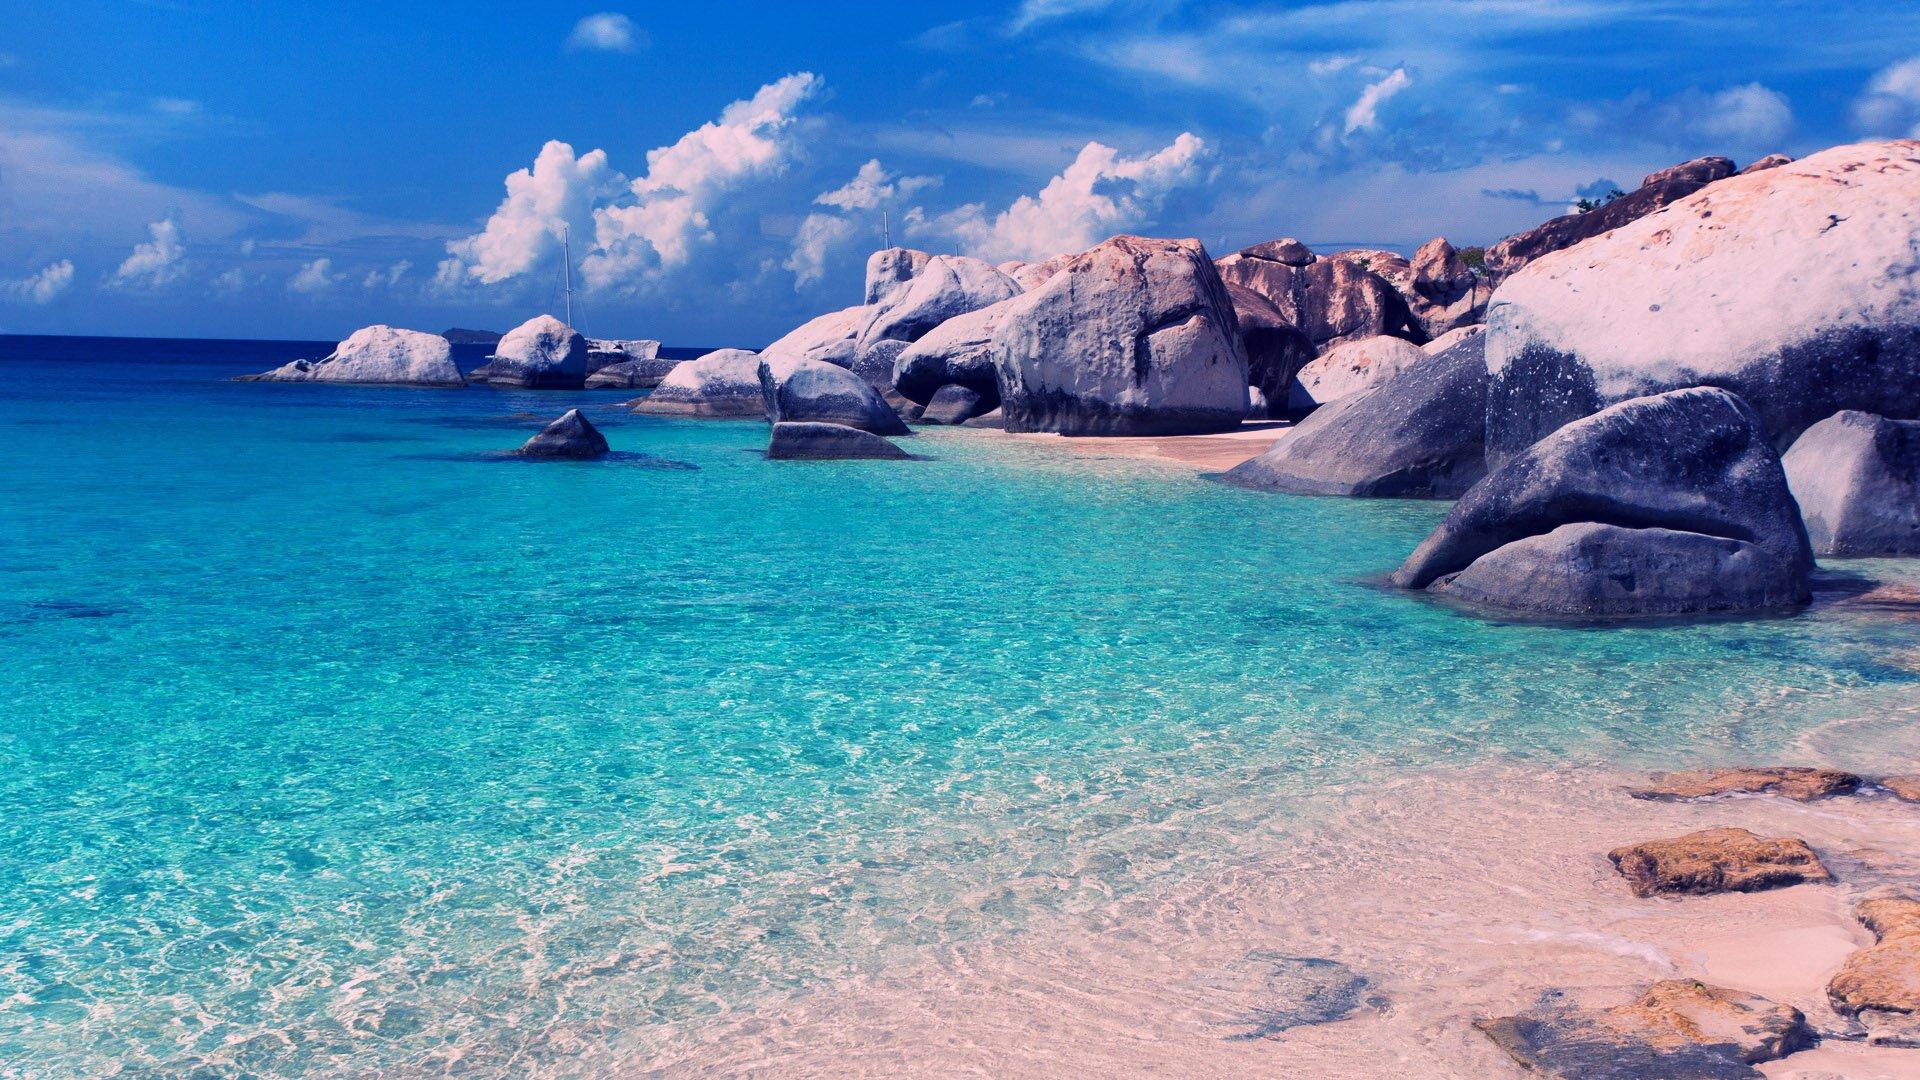 Beautiful Beach Backgrounds 19201080 120995 HD Wallpaper Res 1920x1080